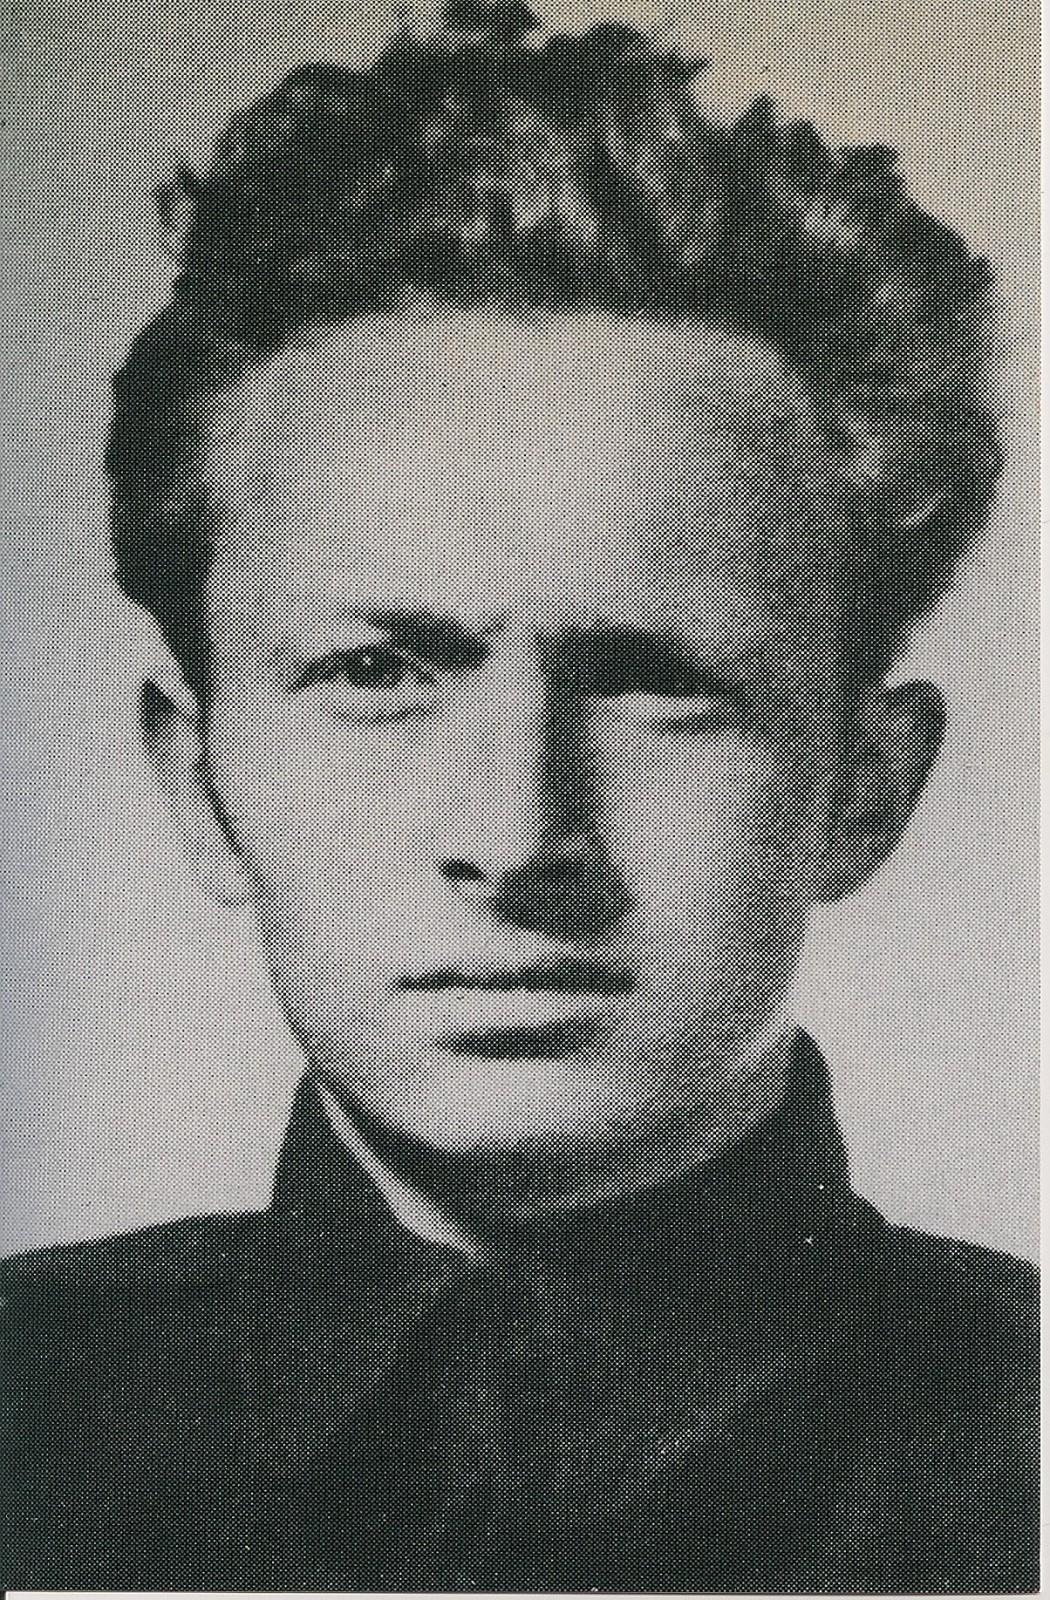 Rolf Utne